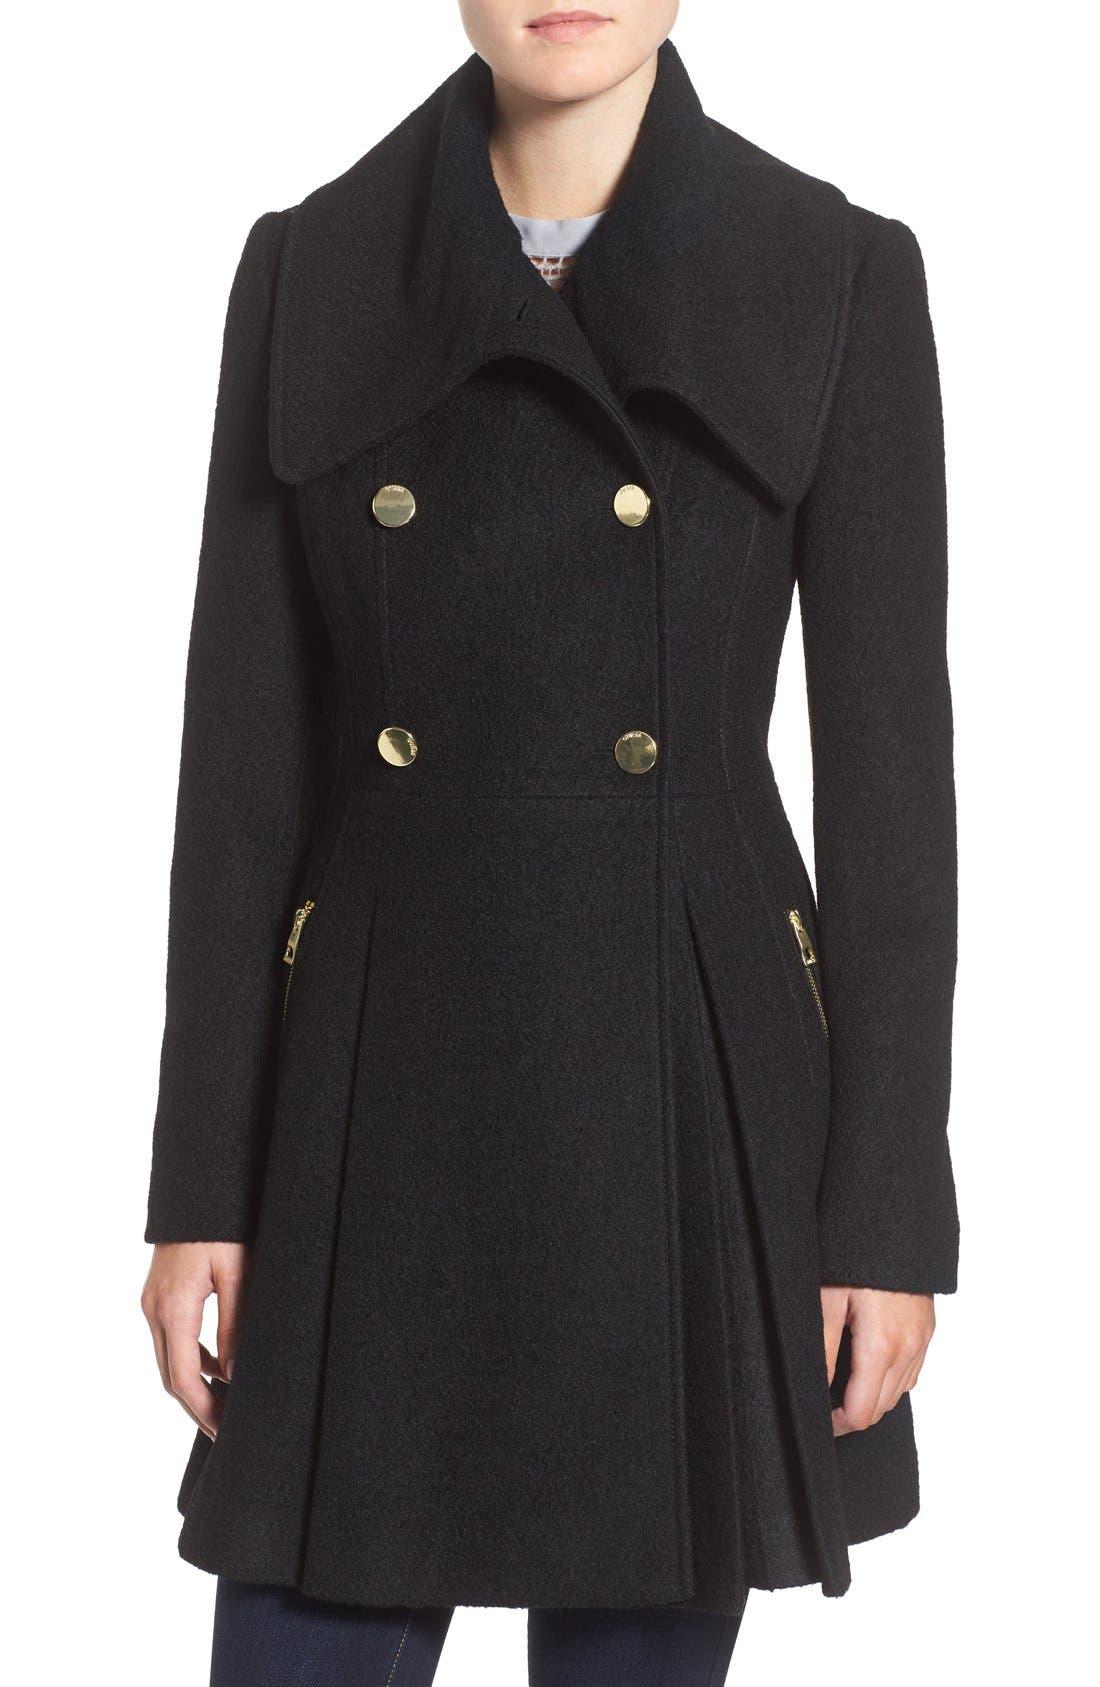 Main Image - GUESS Envelope Collar Double Breasted Coat (Regular & Petite)